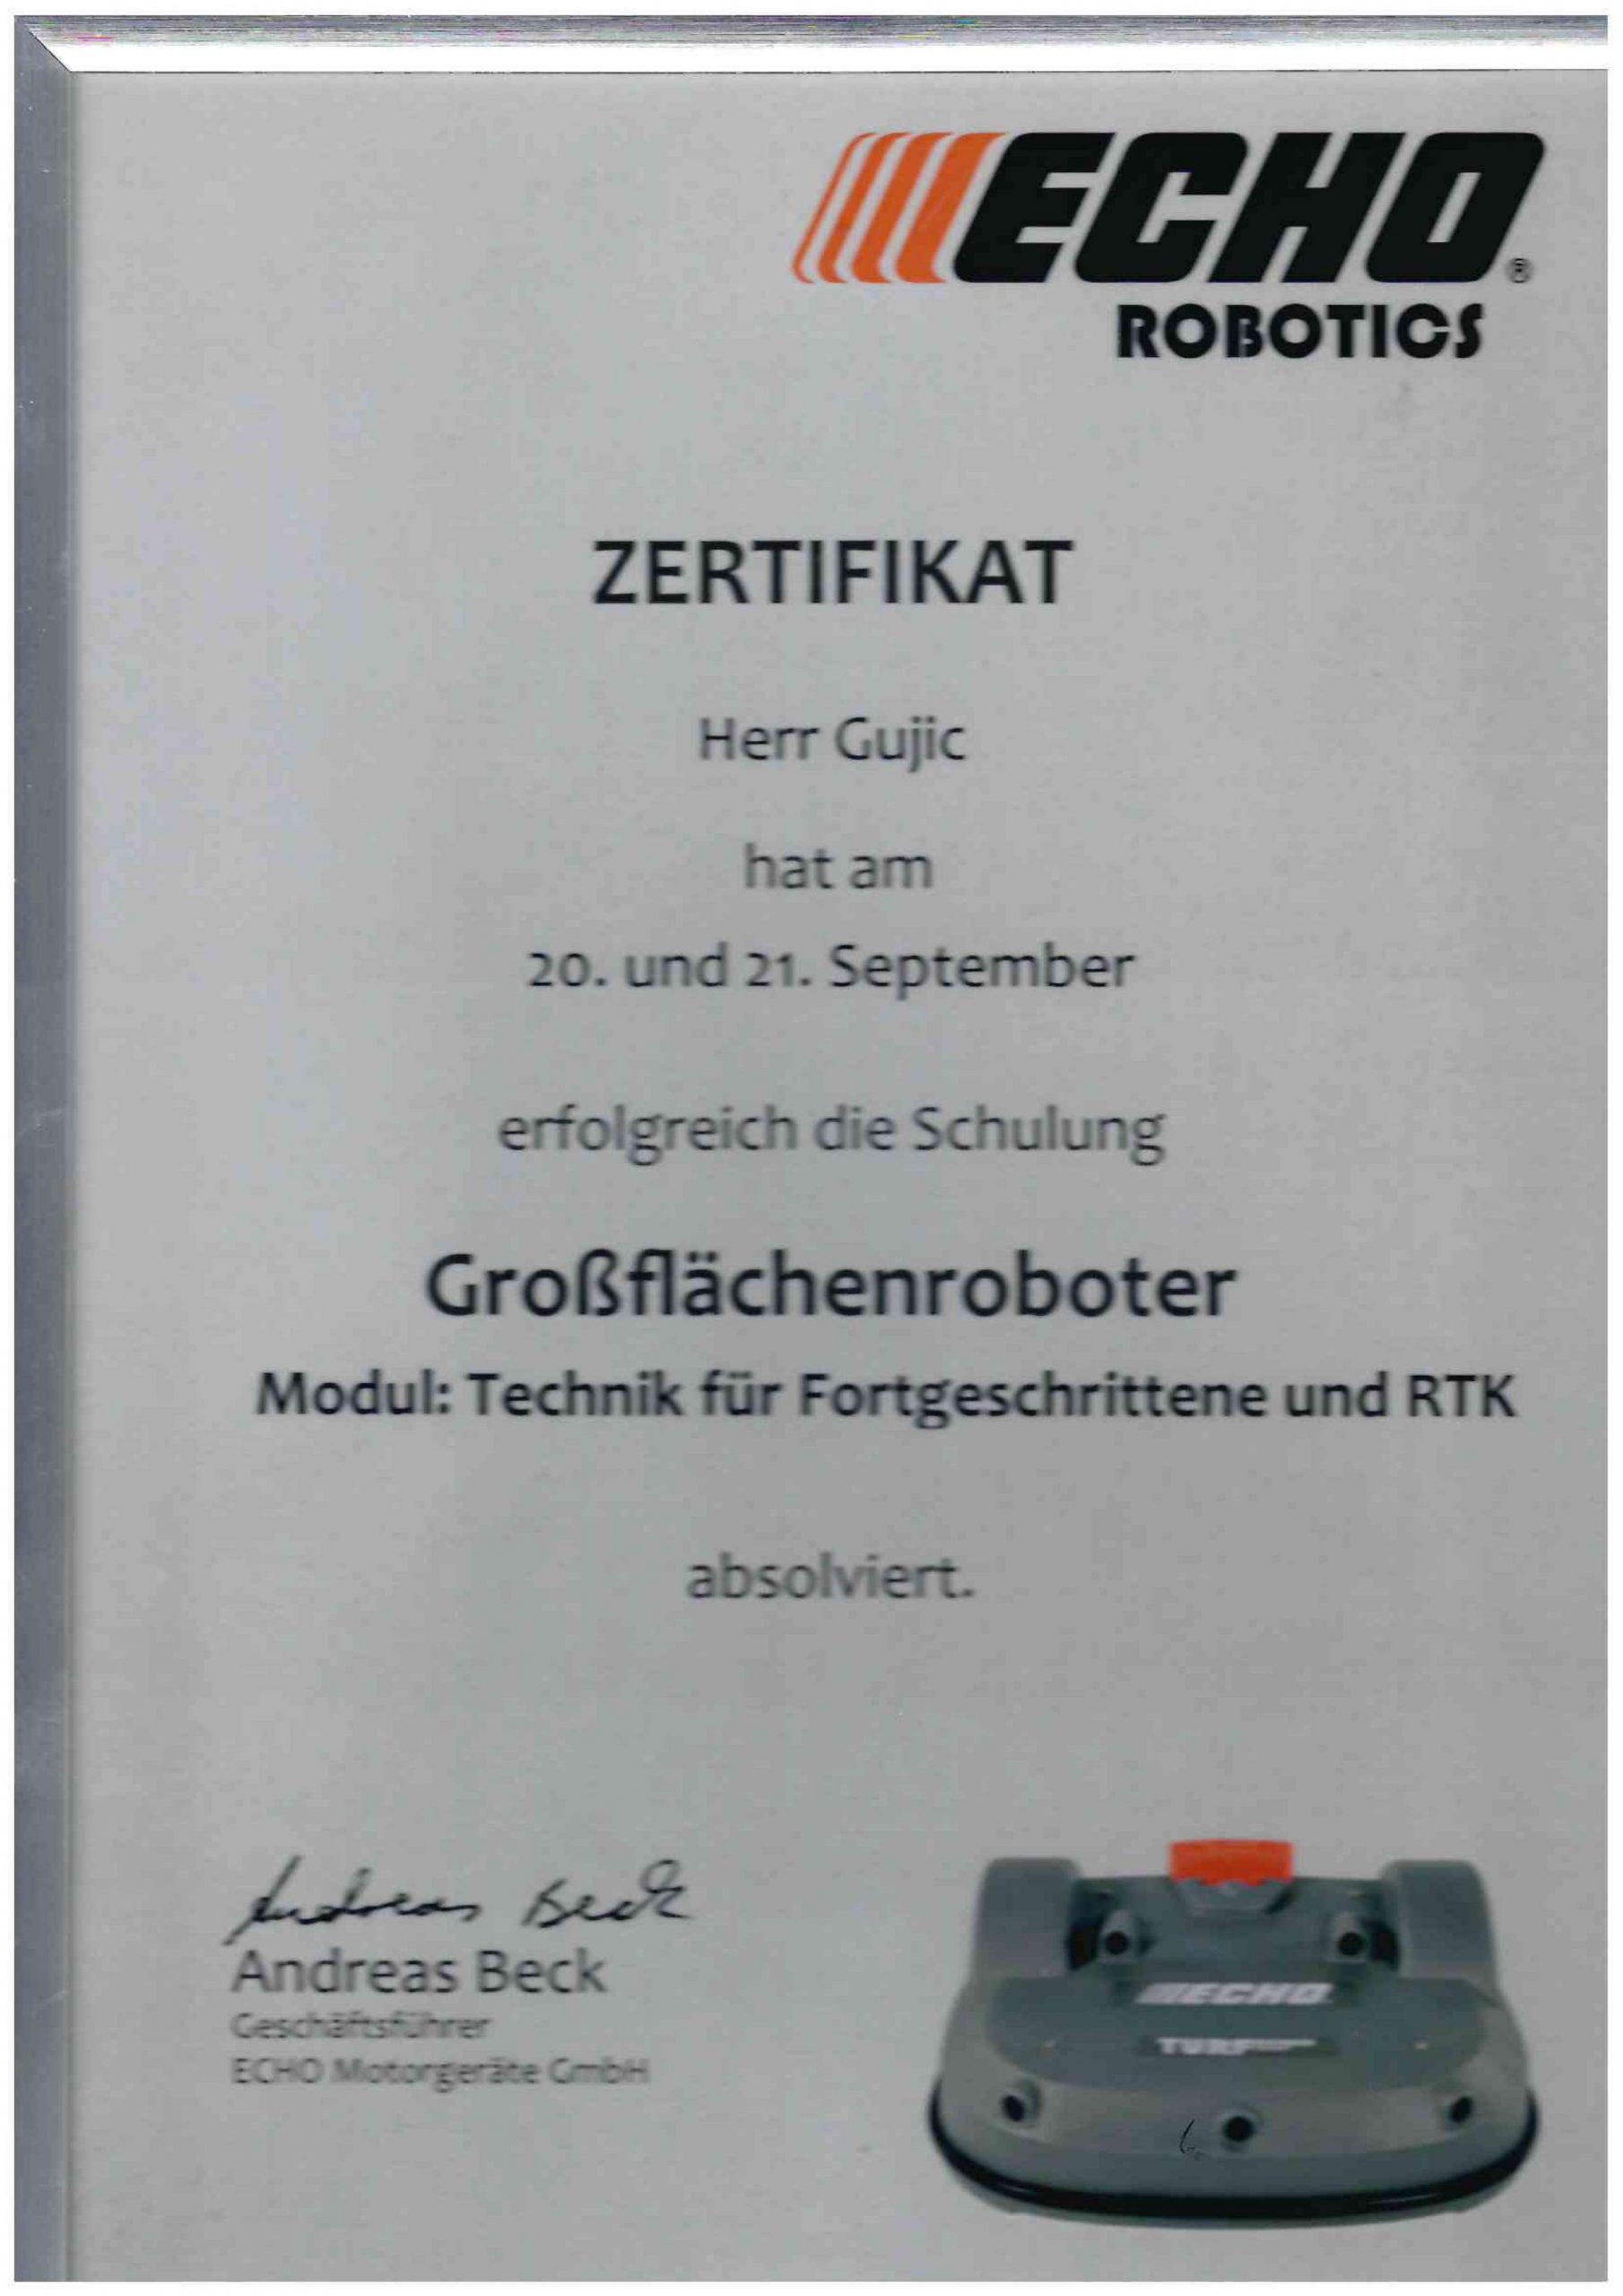 Zertifikat Herr Gujic